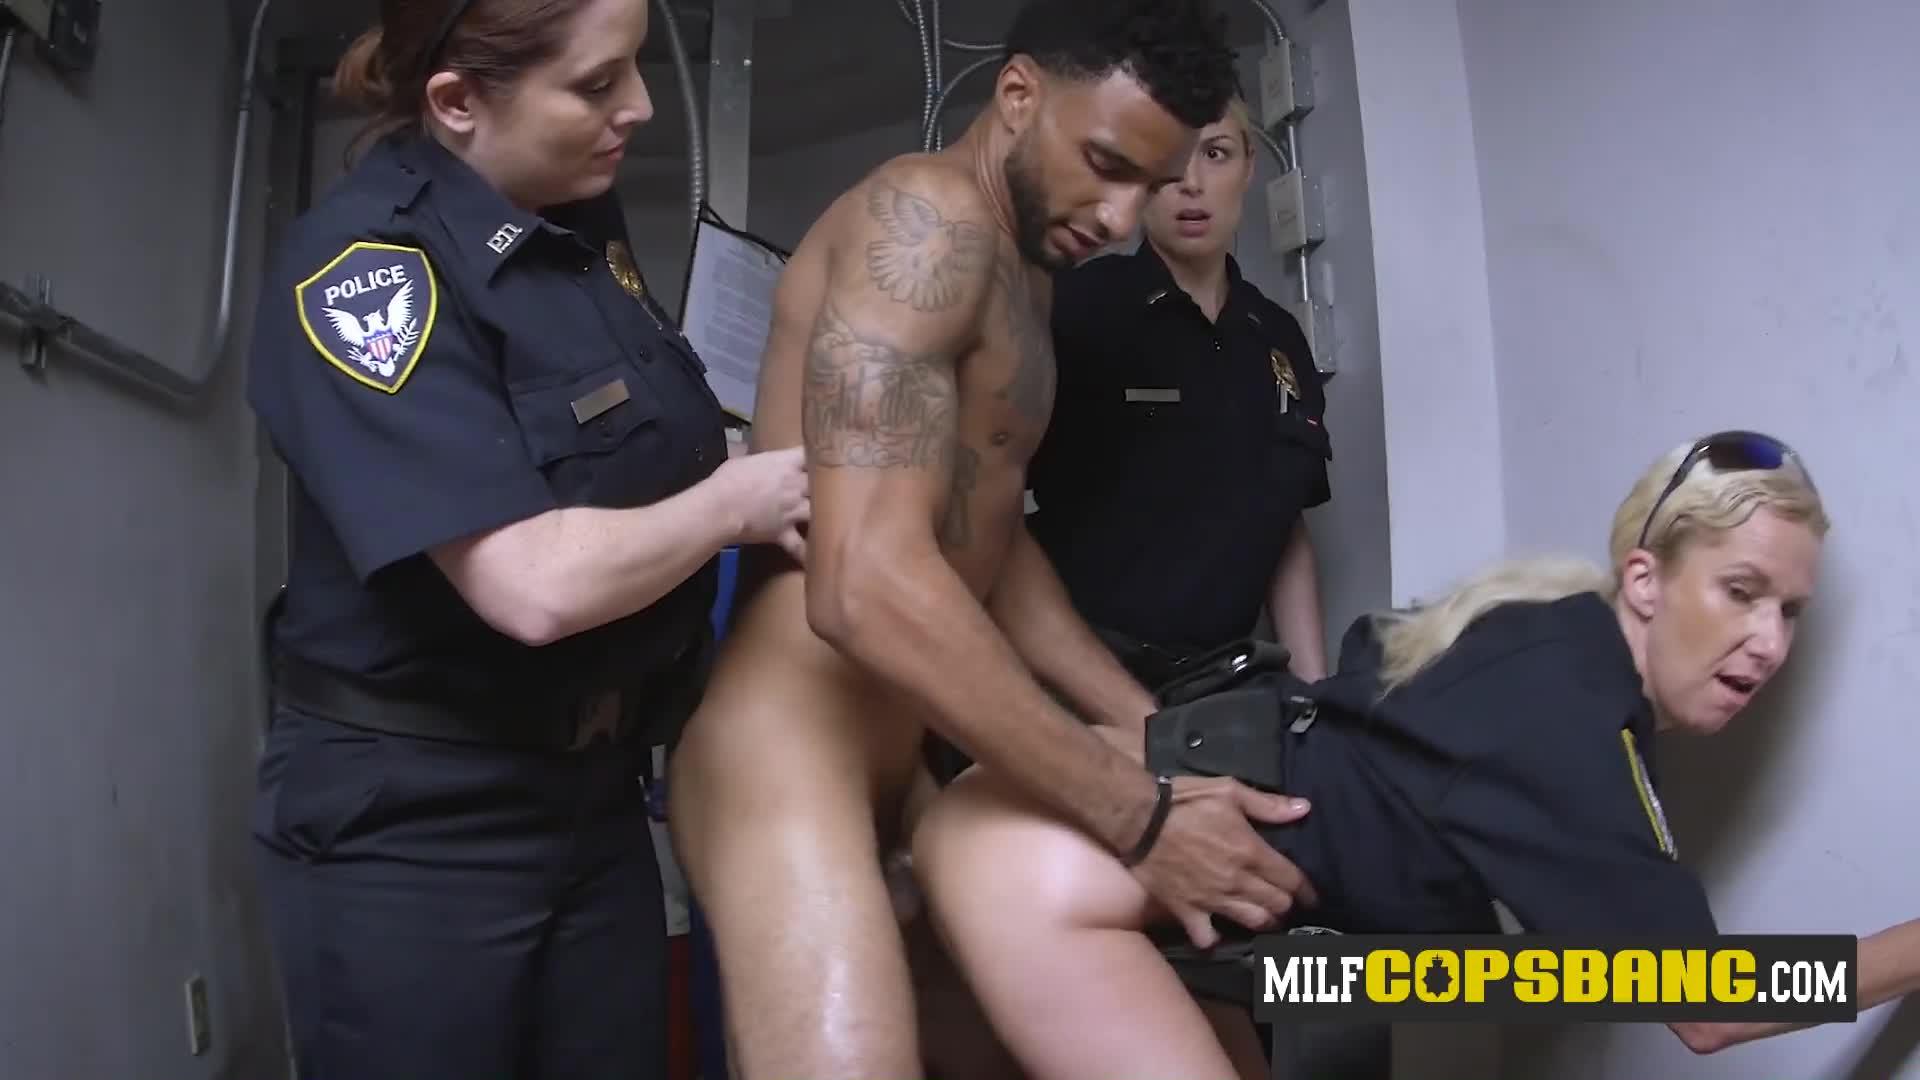 Cops have sex on photo, ignoring robbery alert on radio